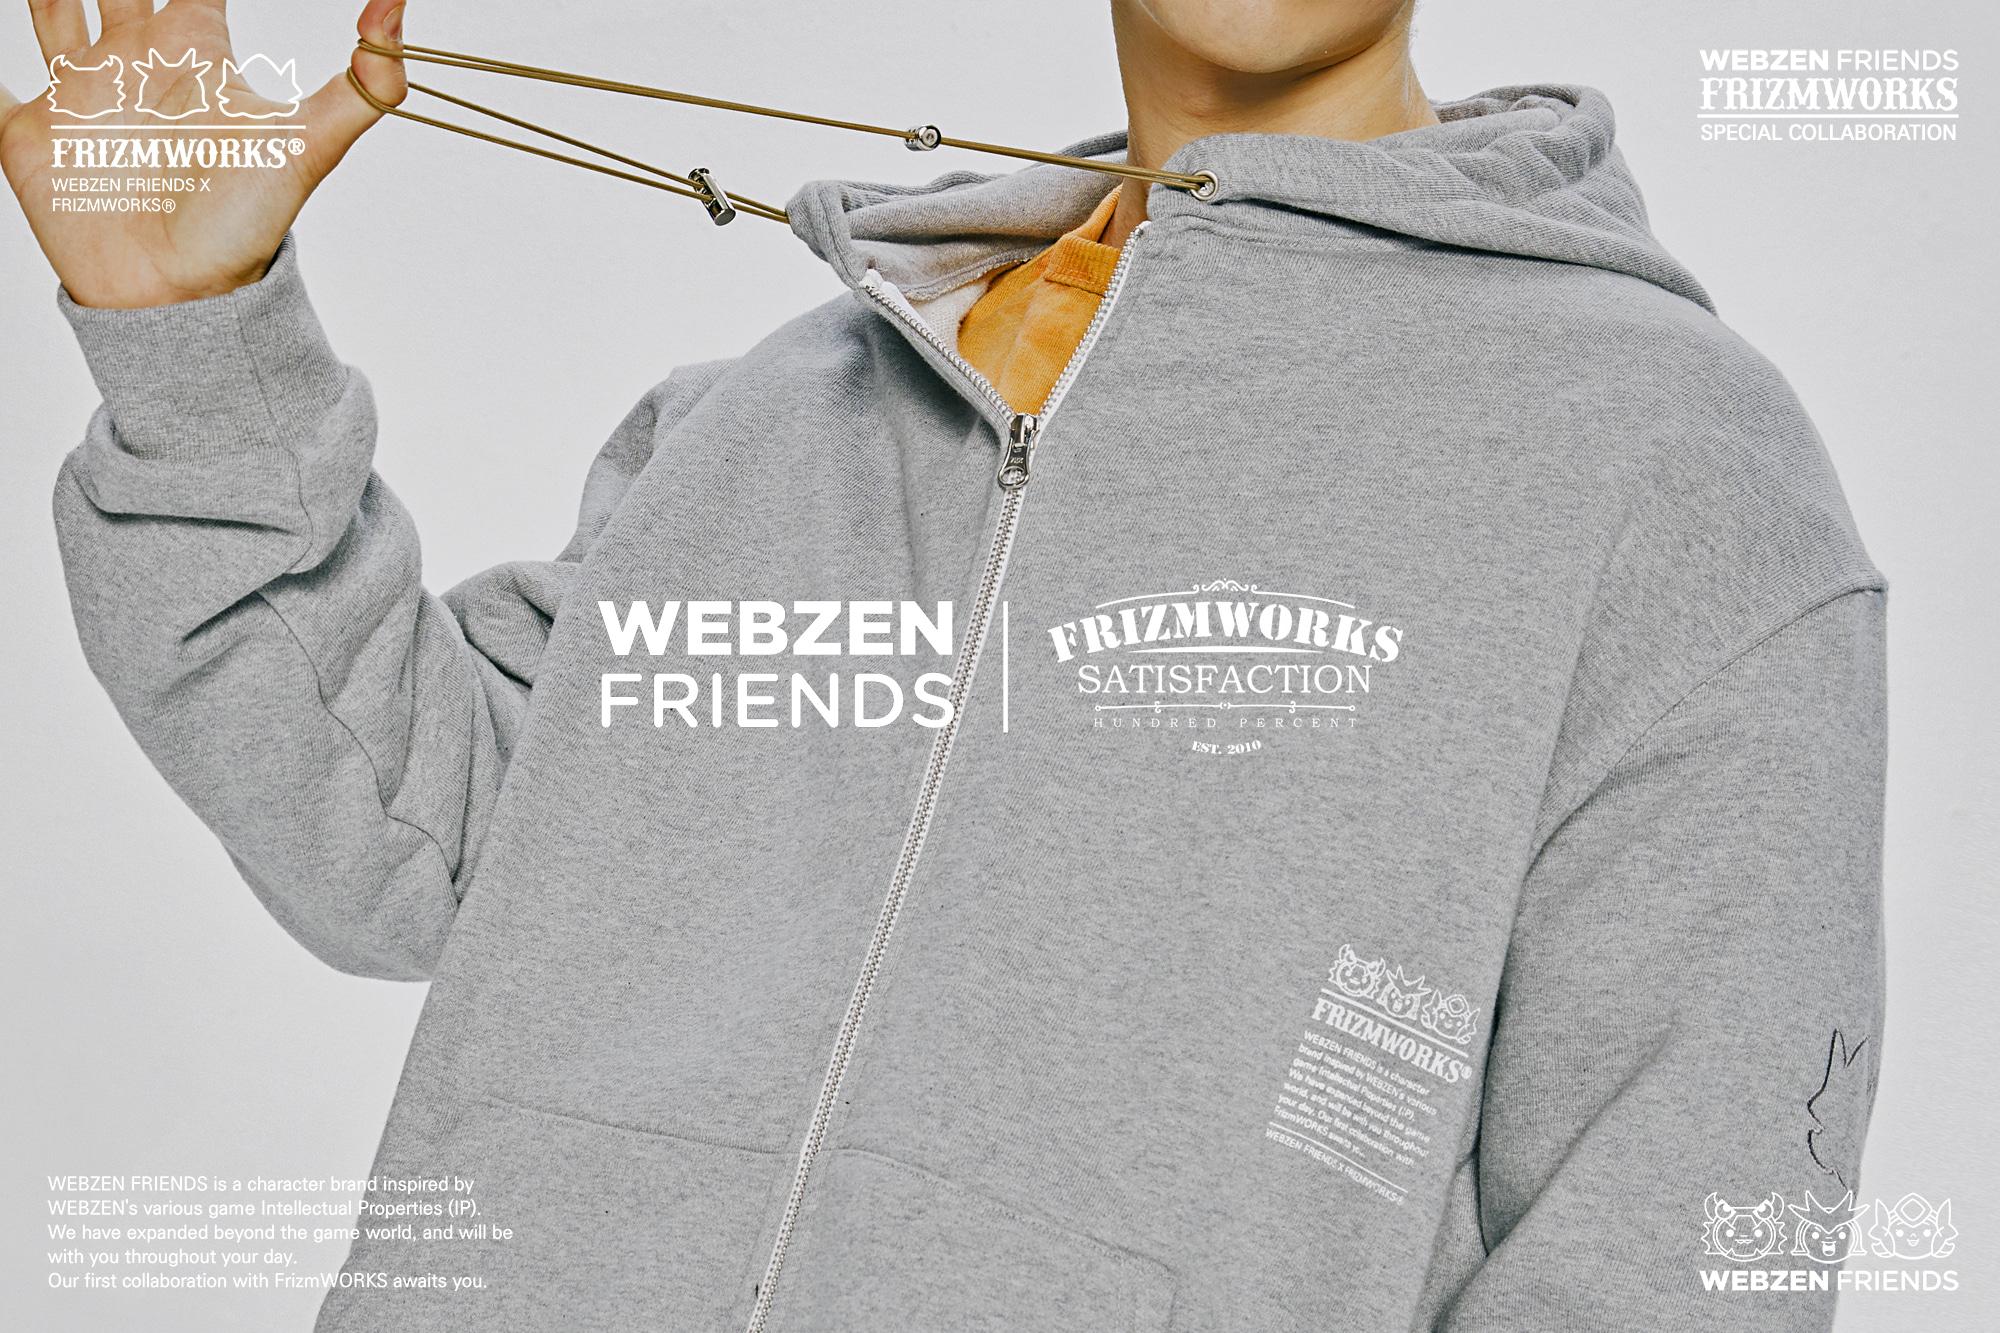 FrizmWORKS X WEBZEN Friends 2021 Special Collaboration Lookbook